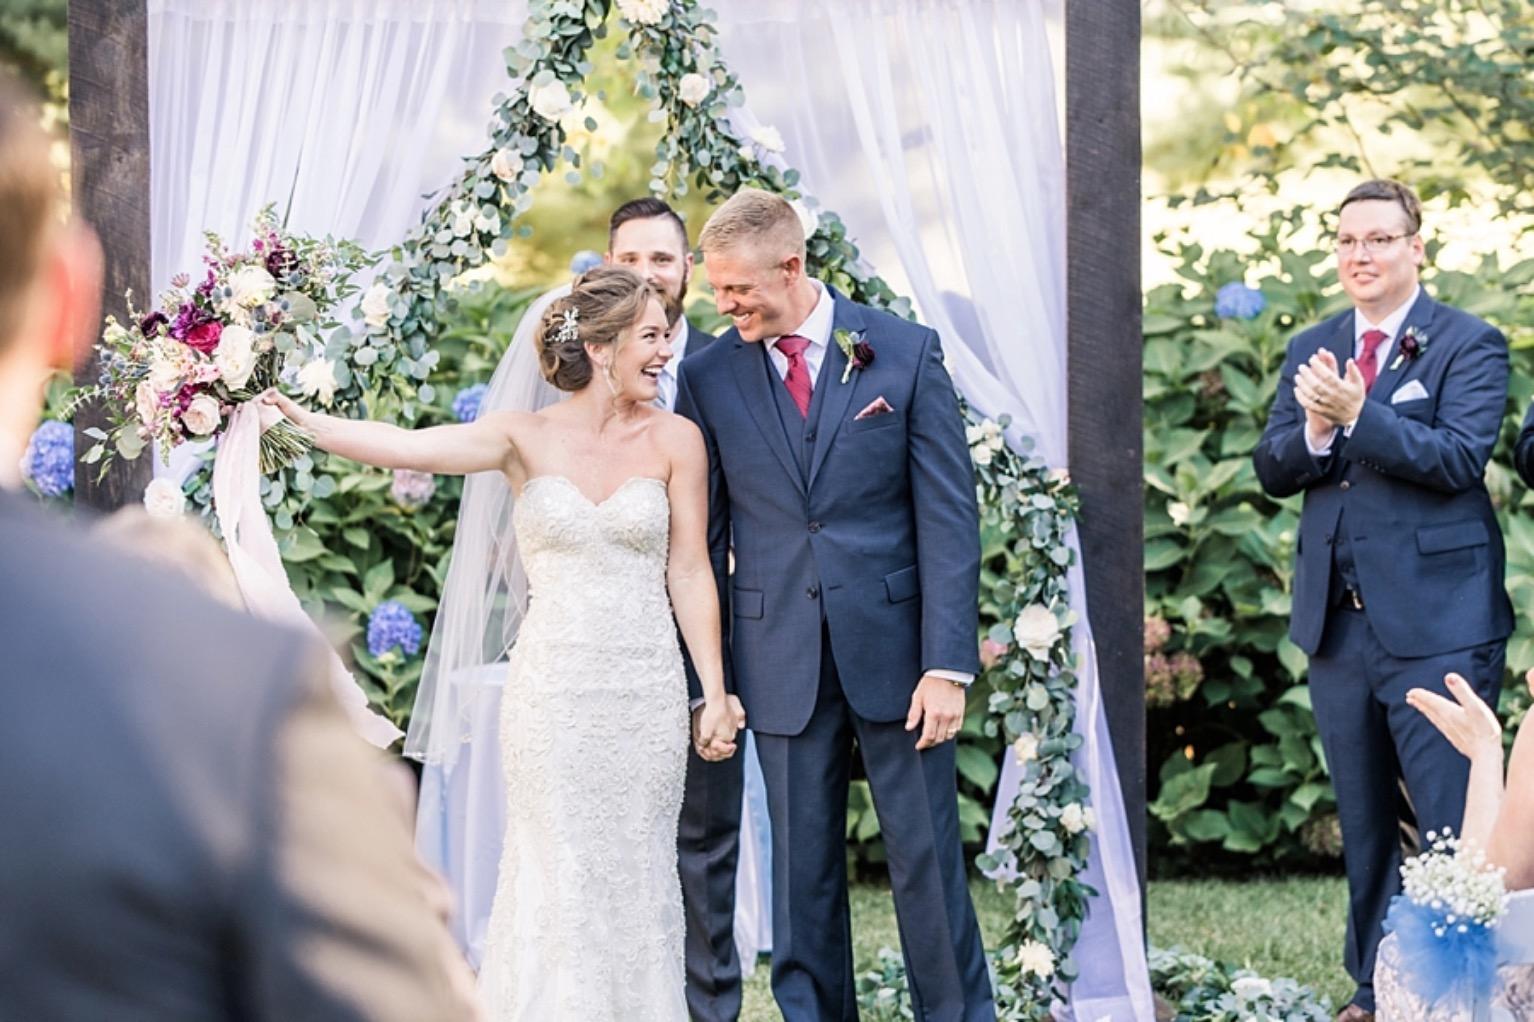 Jessica + Joel on September 23, 2017 ♥ Stephanie Mesick Photography at Airlie Center (Warrenton, VA)